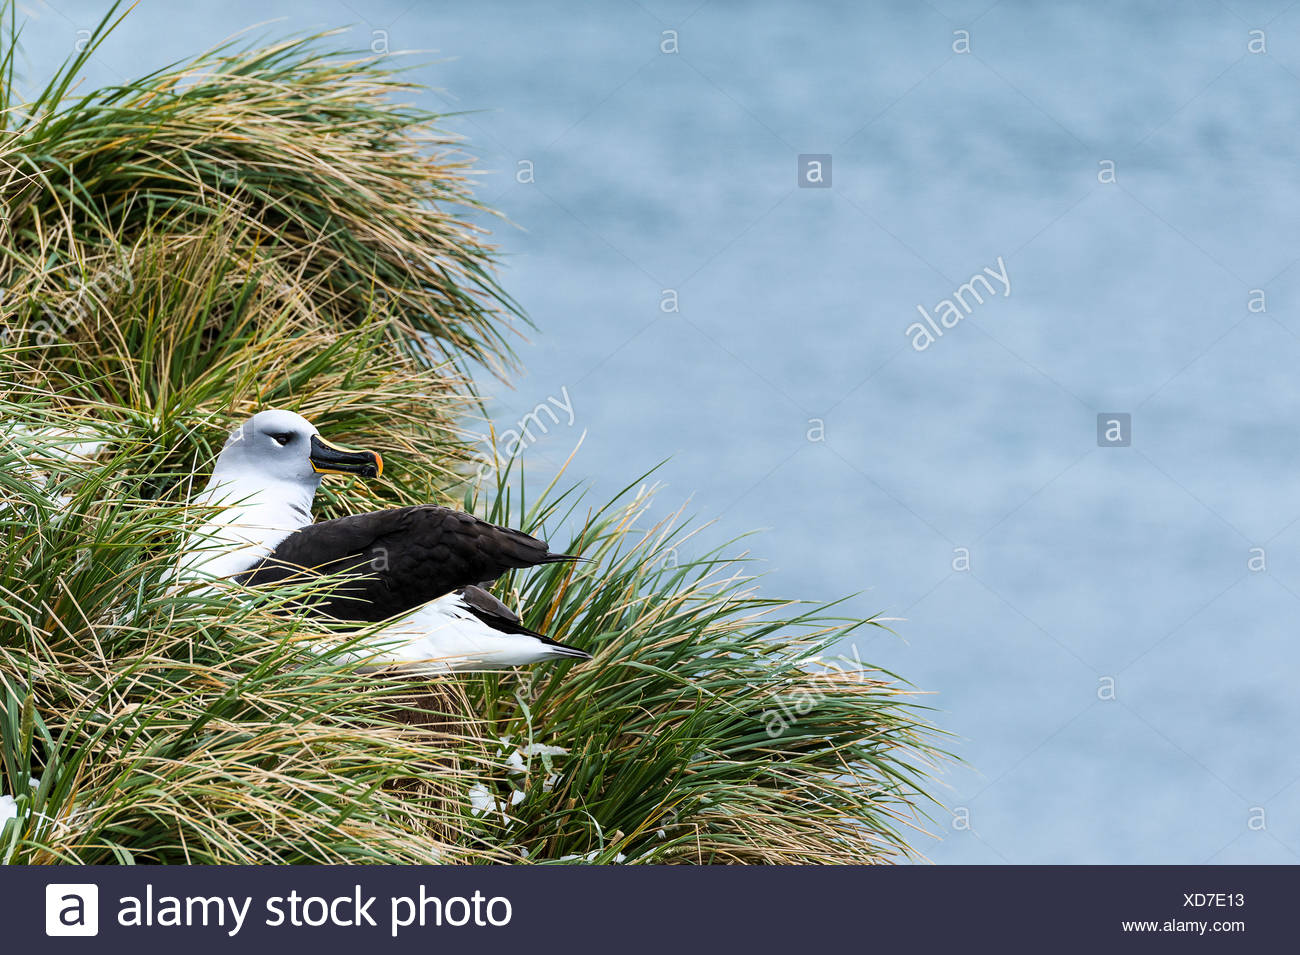 Black-browed albatross (Thalassarche melanophris) nesting; South Georgia, South Georgia and the South Sandwich Islands, United Kingdom - Stock Image